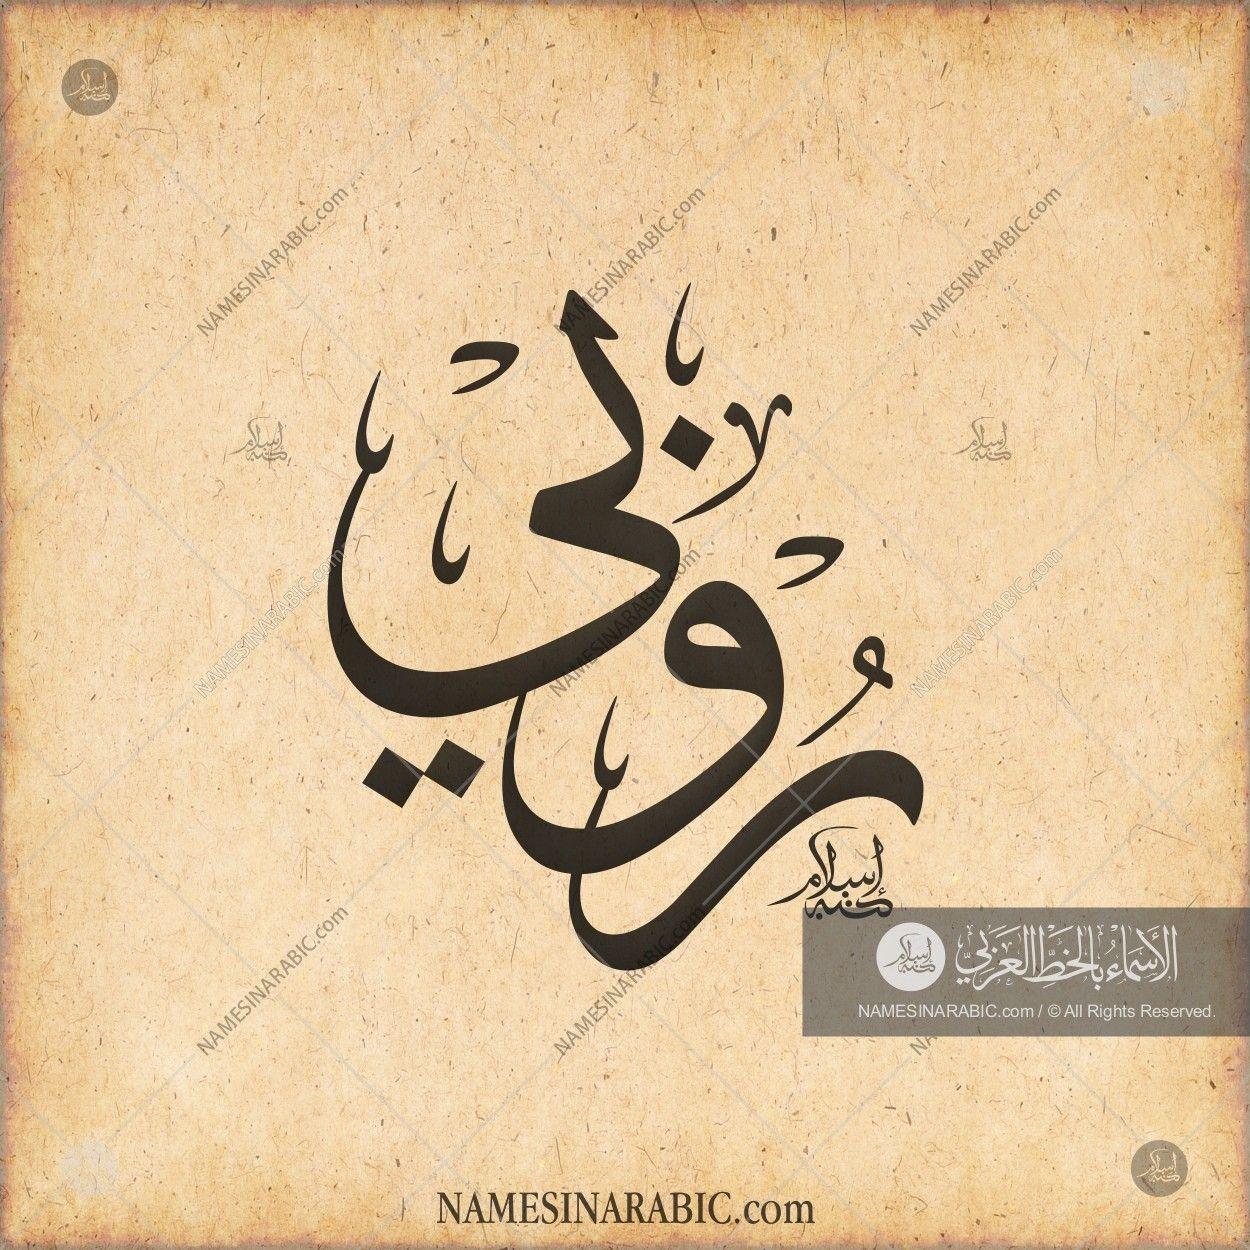 Rubi روبي Names In Arabic Calligraphy Name 3458 Calligraphy Name Calligraphy Arabic Calligraphy